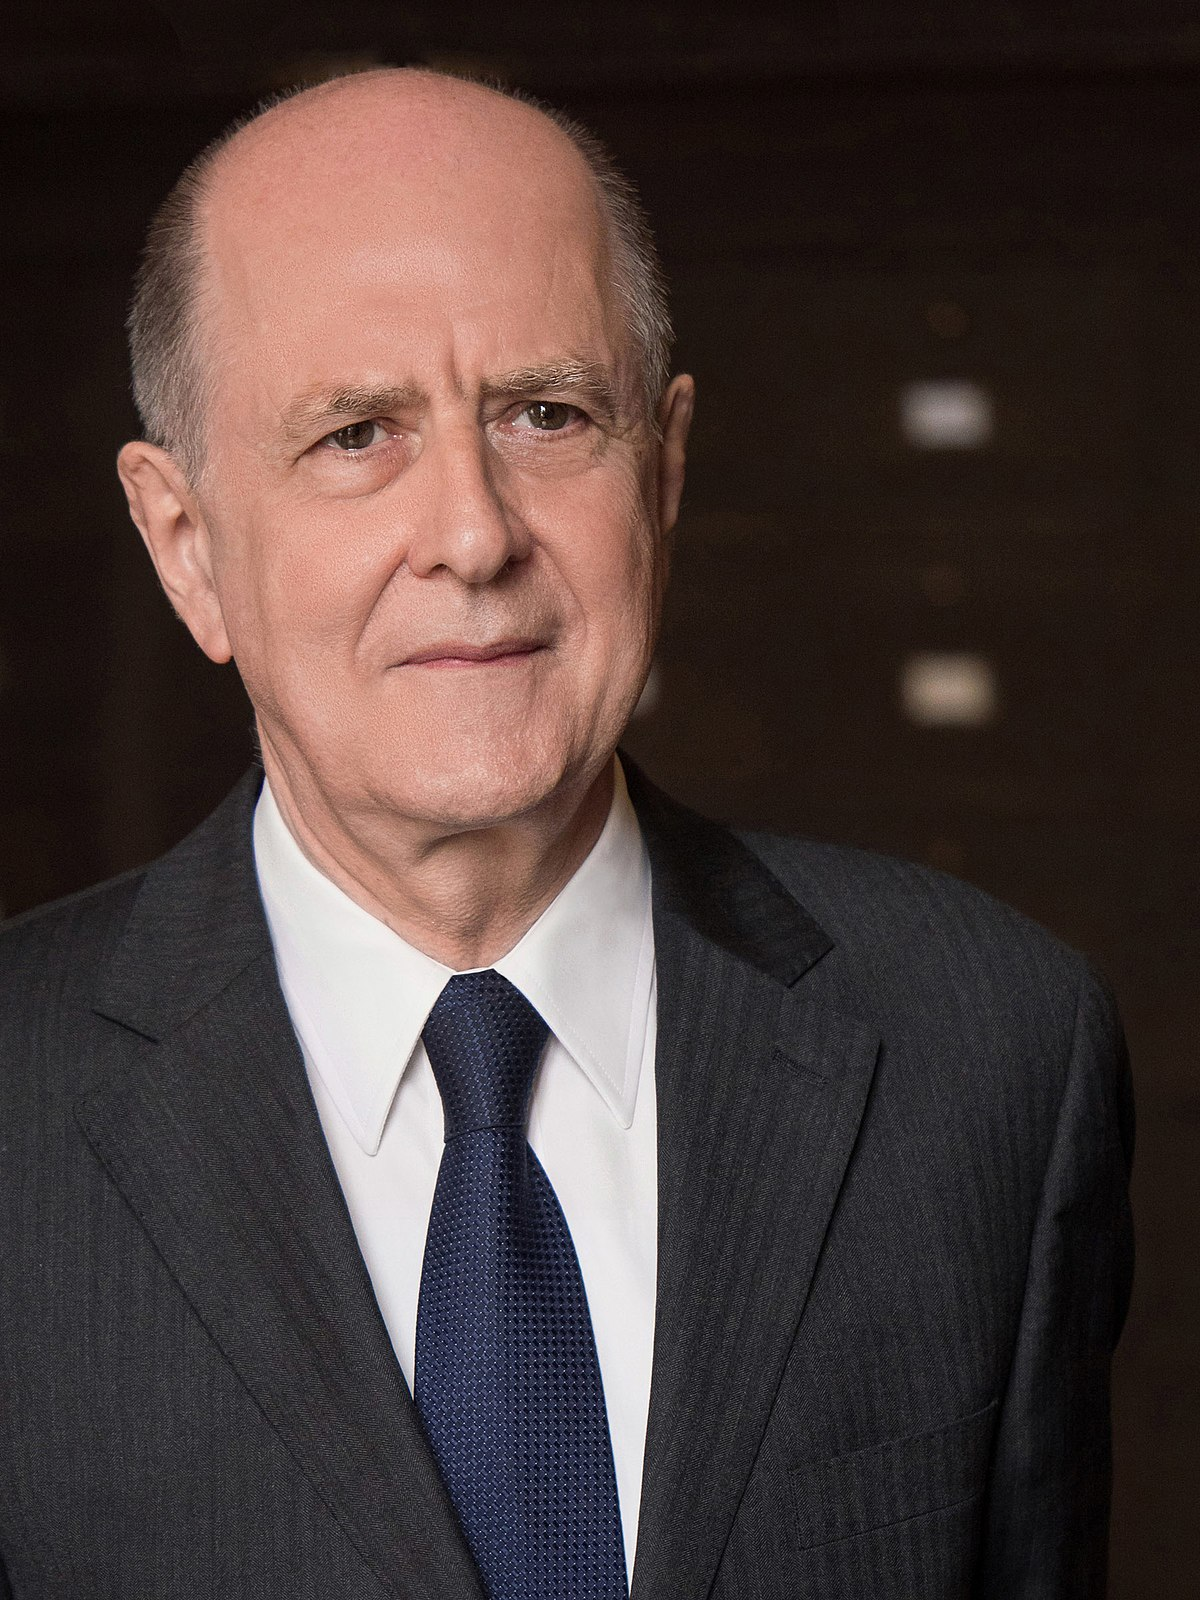 File:Jean-Marc Sauvé - 2016.jpg - Wikimedia Commons